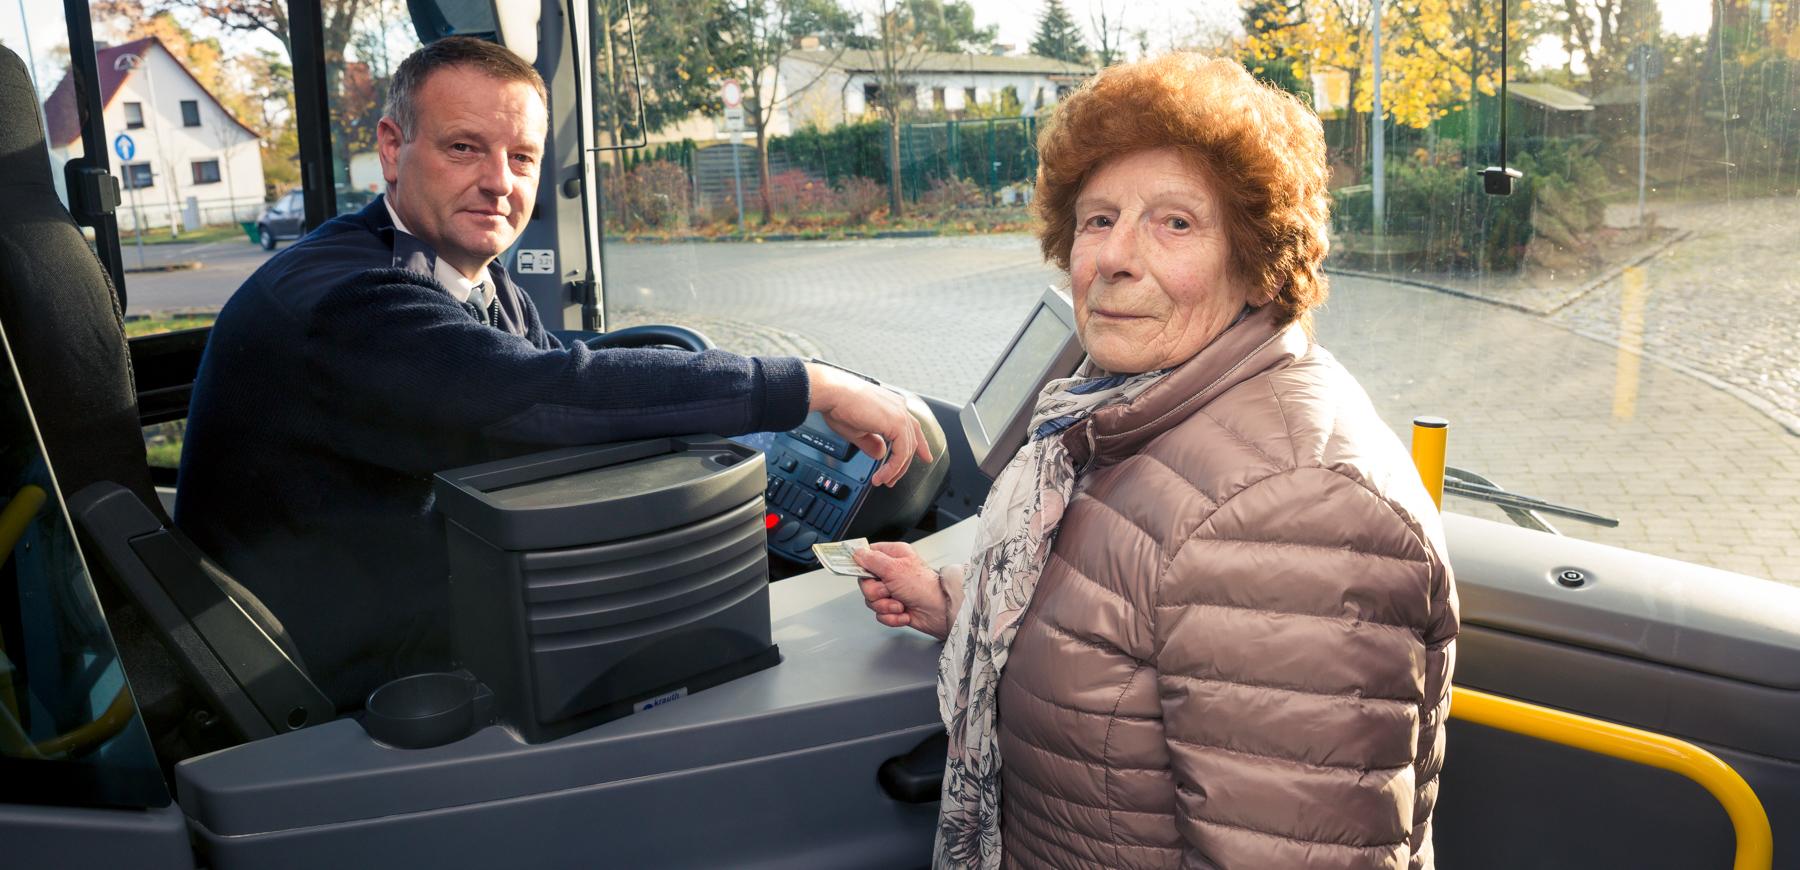 Ältere Dame kauft Fahrschein beim Busfahrer.